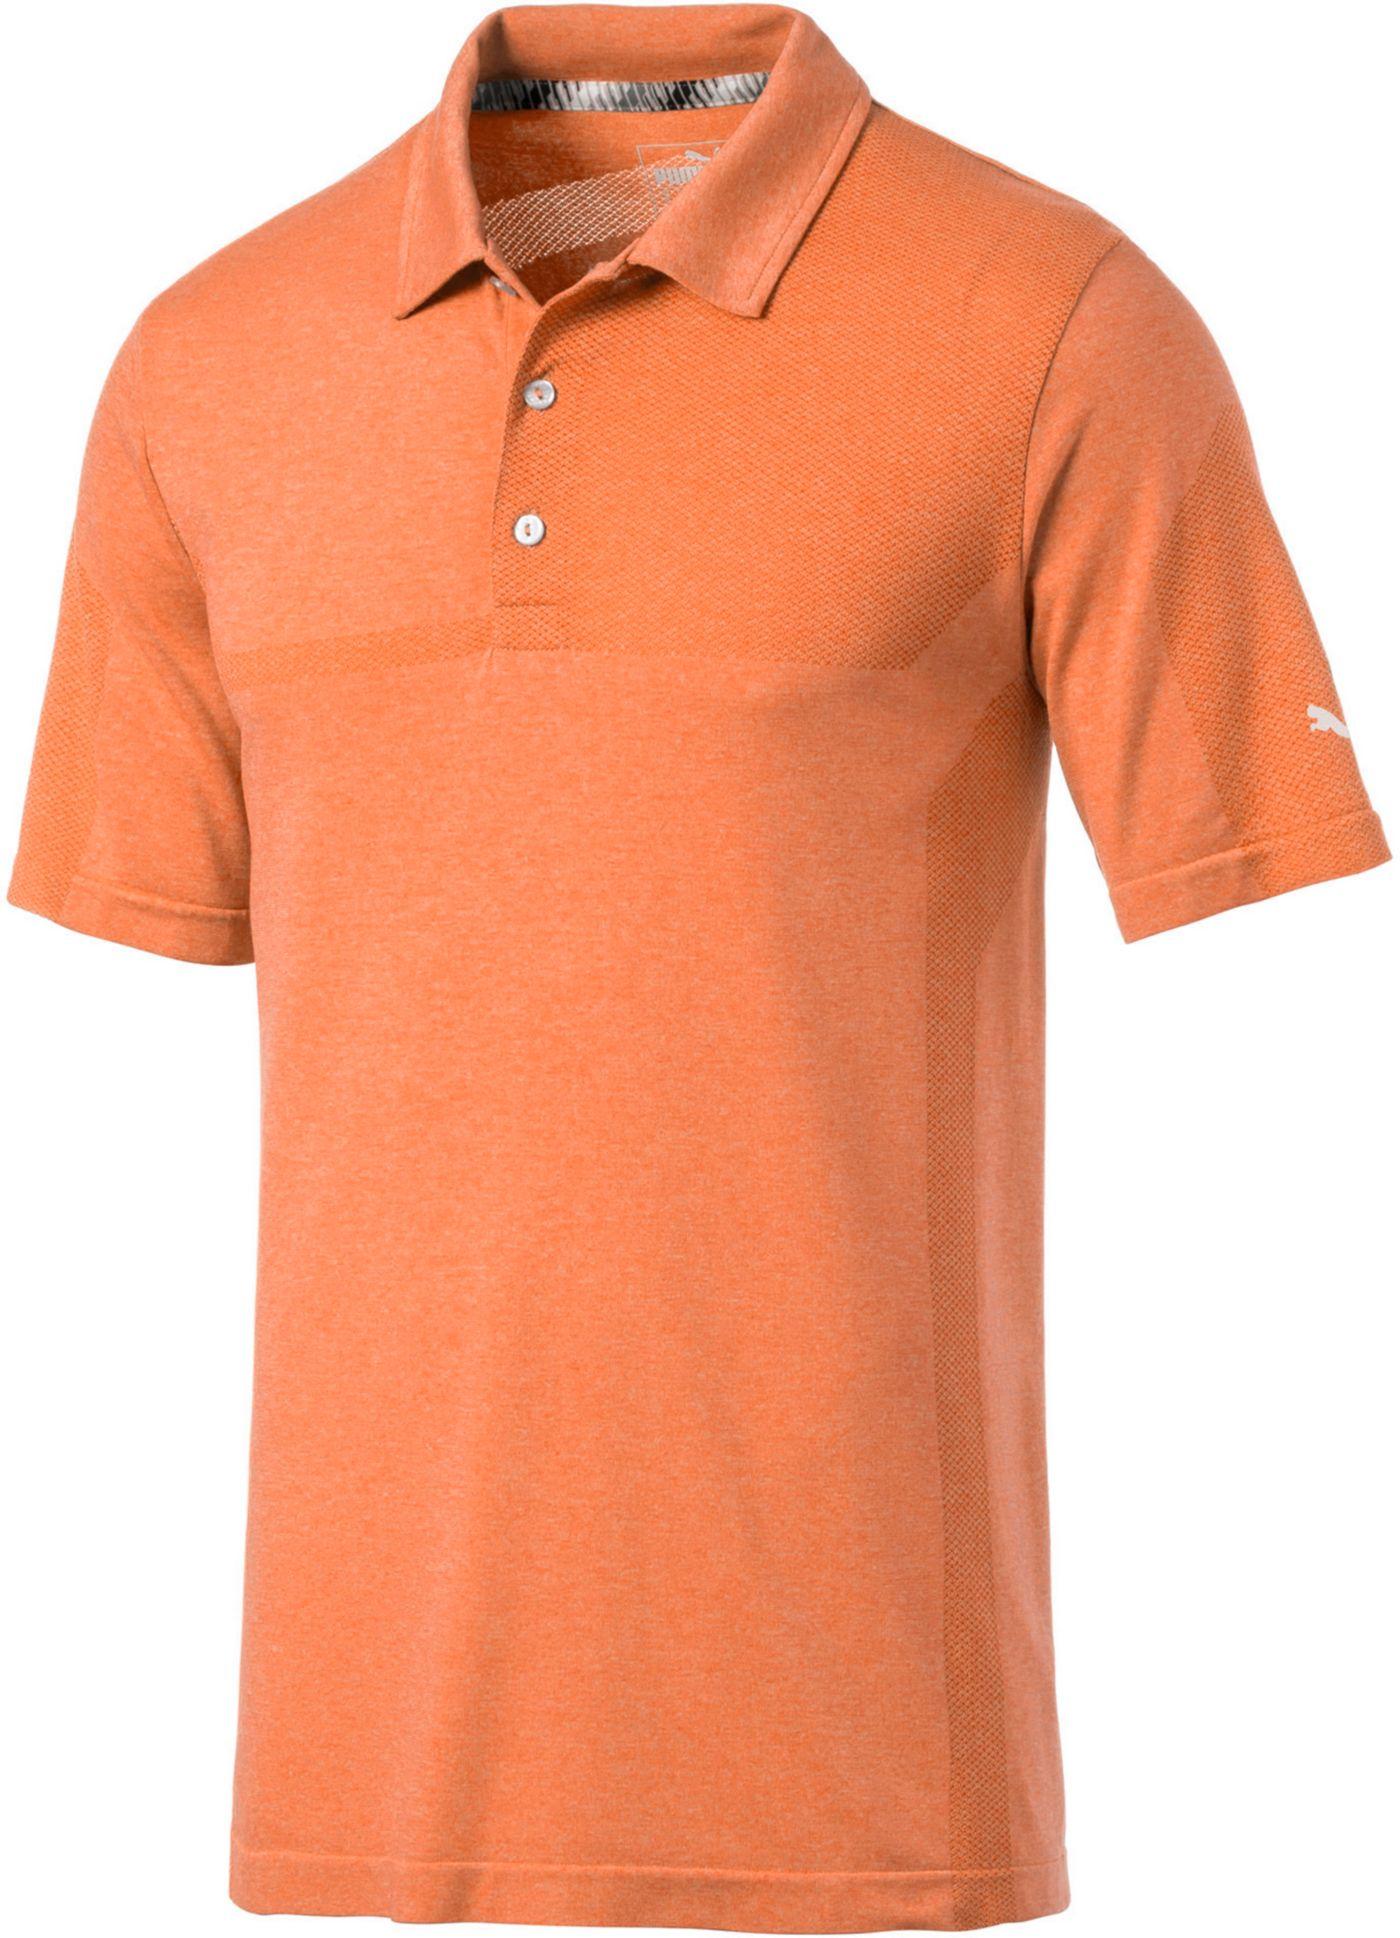 PUMA Men's Evoknit Breakers Golf Polo